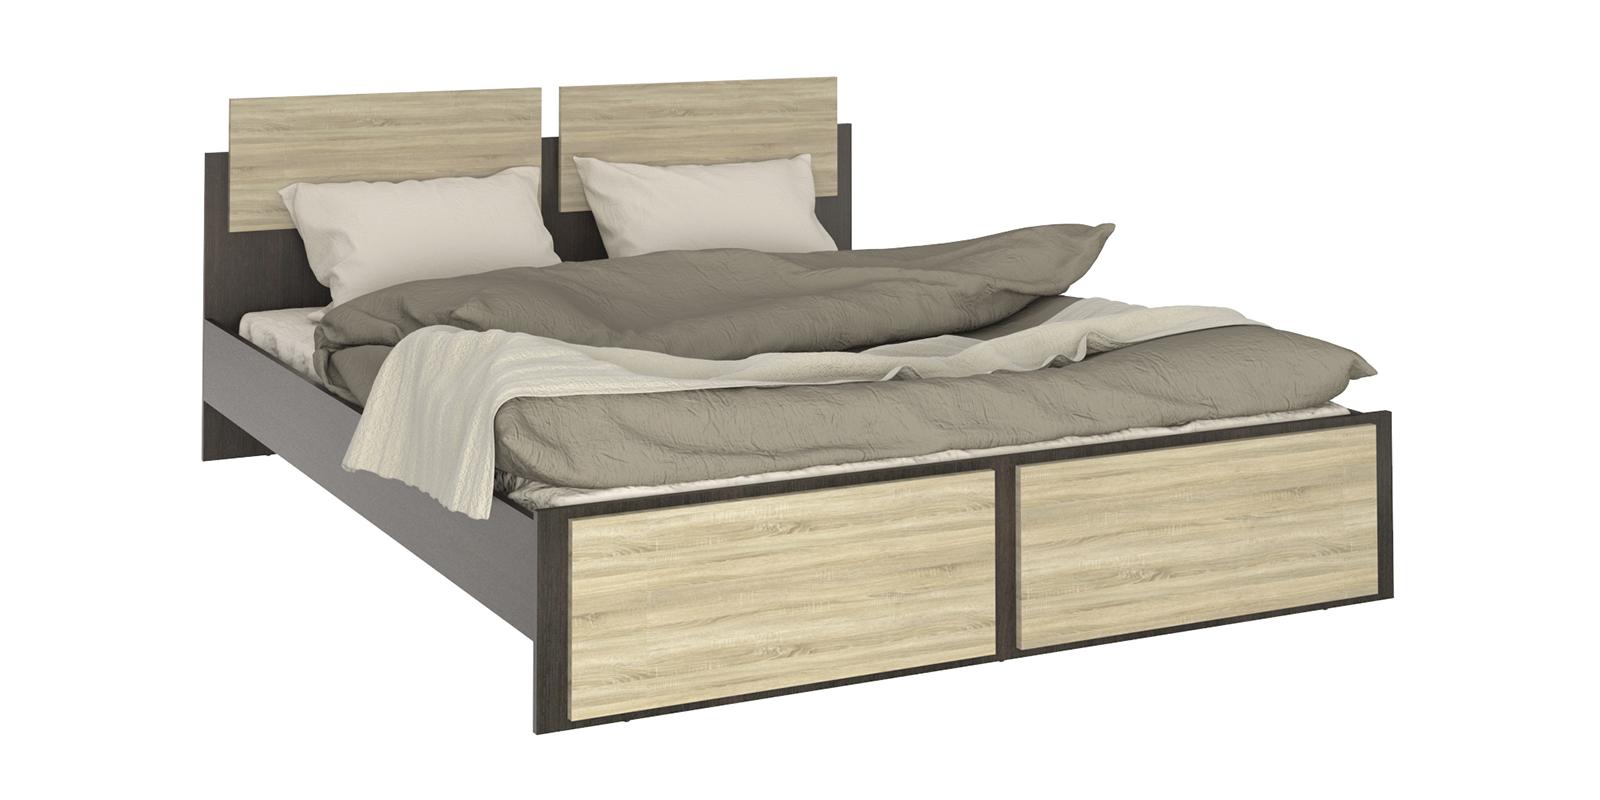 Кровать каркасная HomeMe Мельбурн AFR0085000